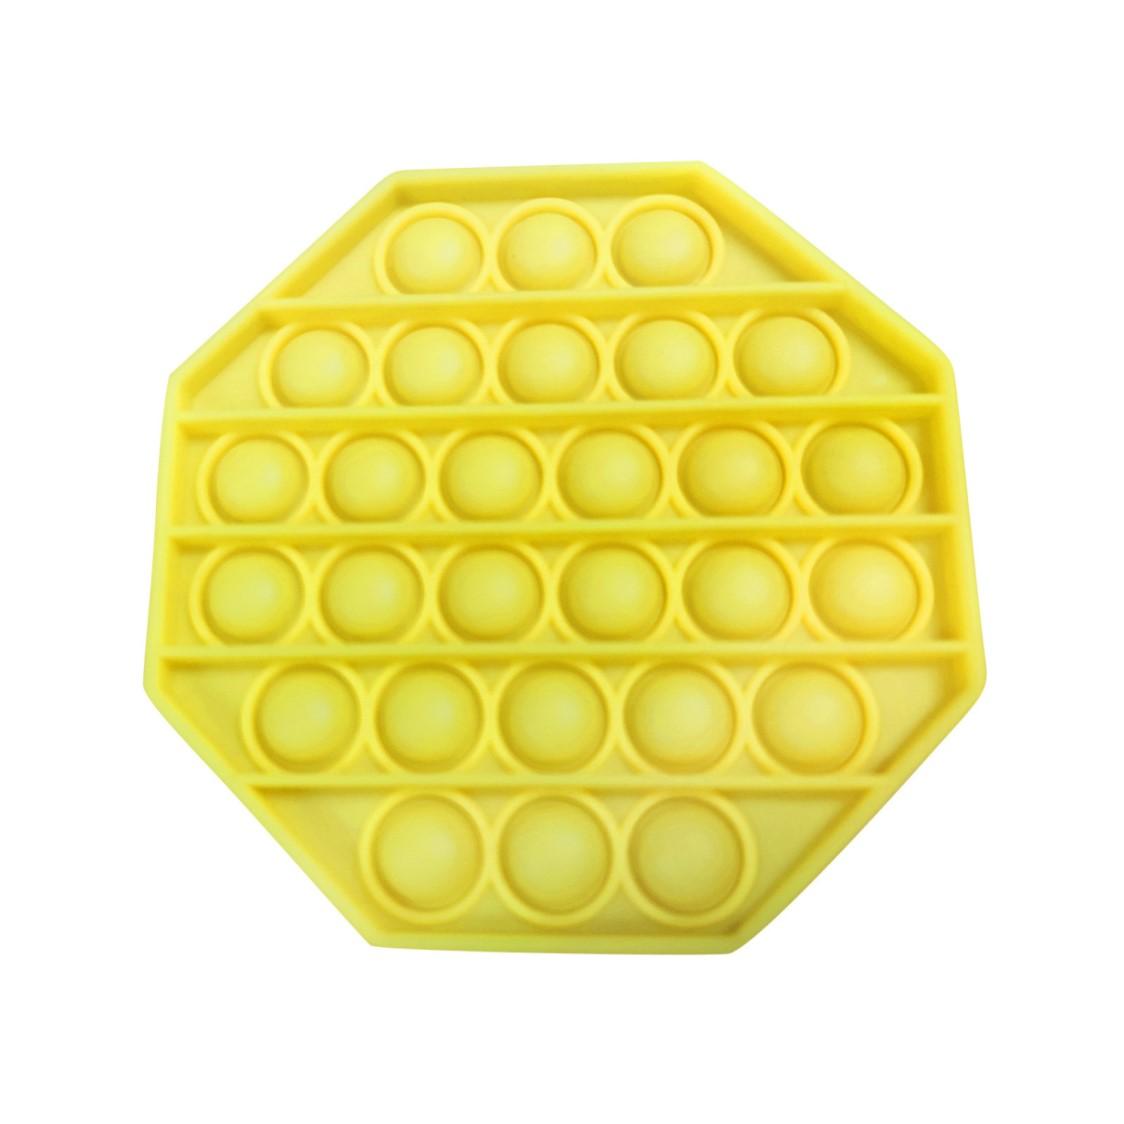 Jucărie senzorială antistress- Pop-it galben, 13 cm imagine edituradiana.ro